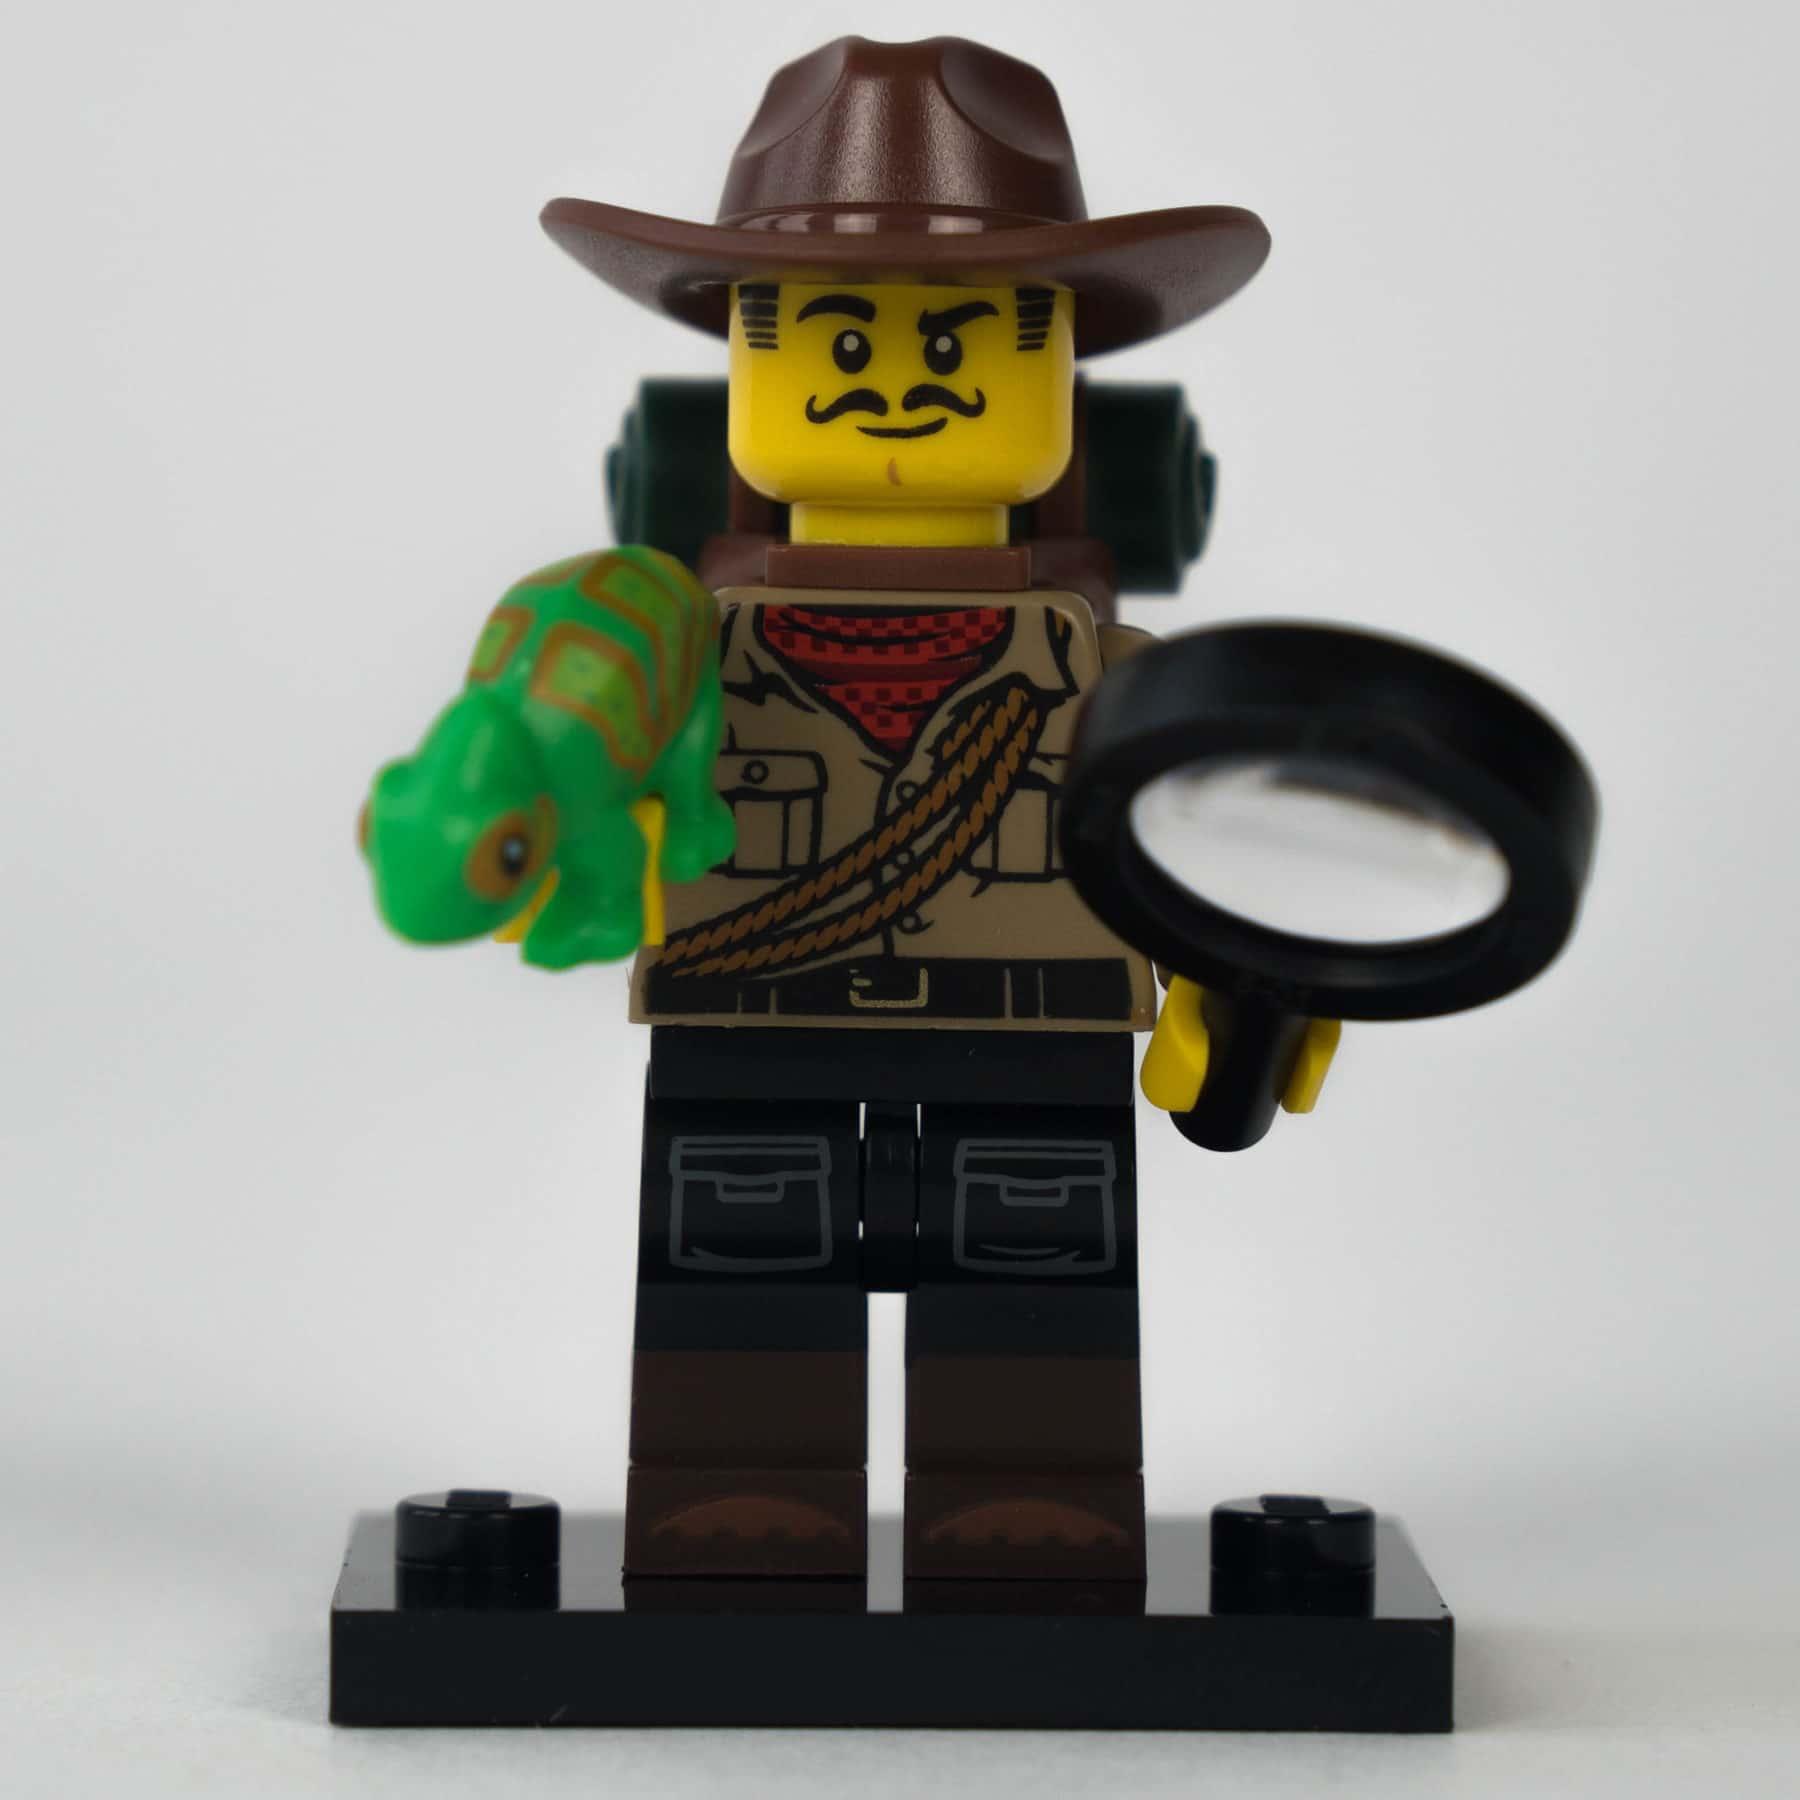 LEGO 71025 Minifigur: Abenteurer